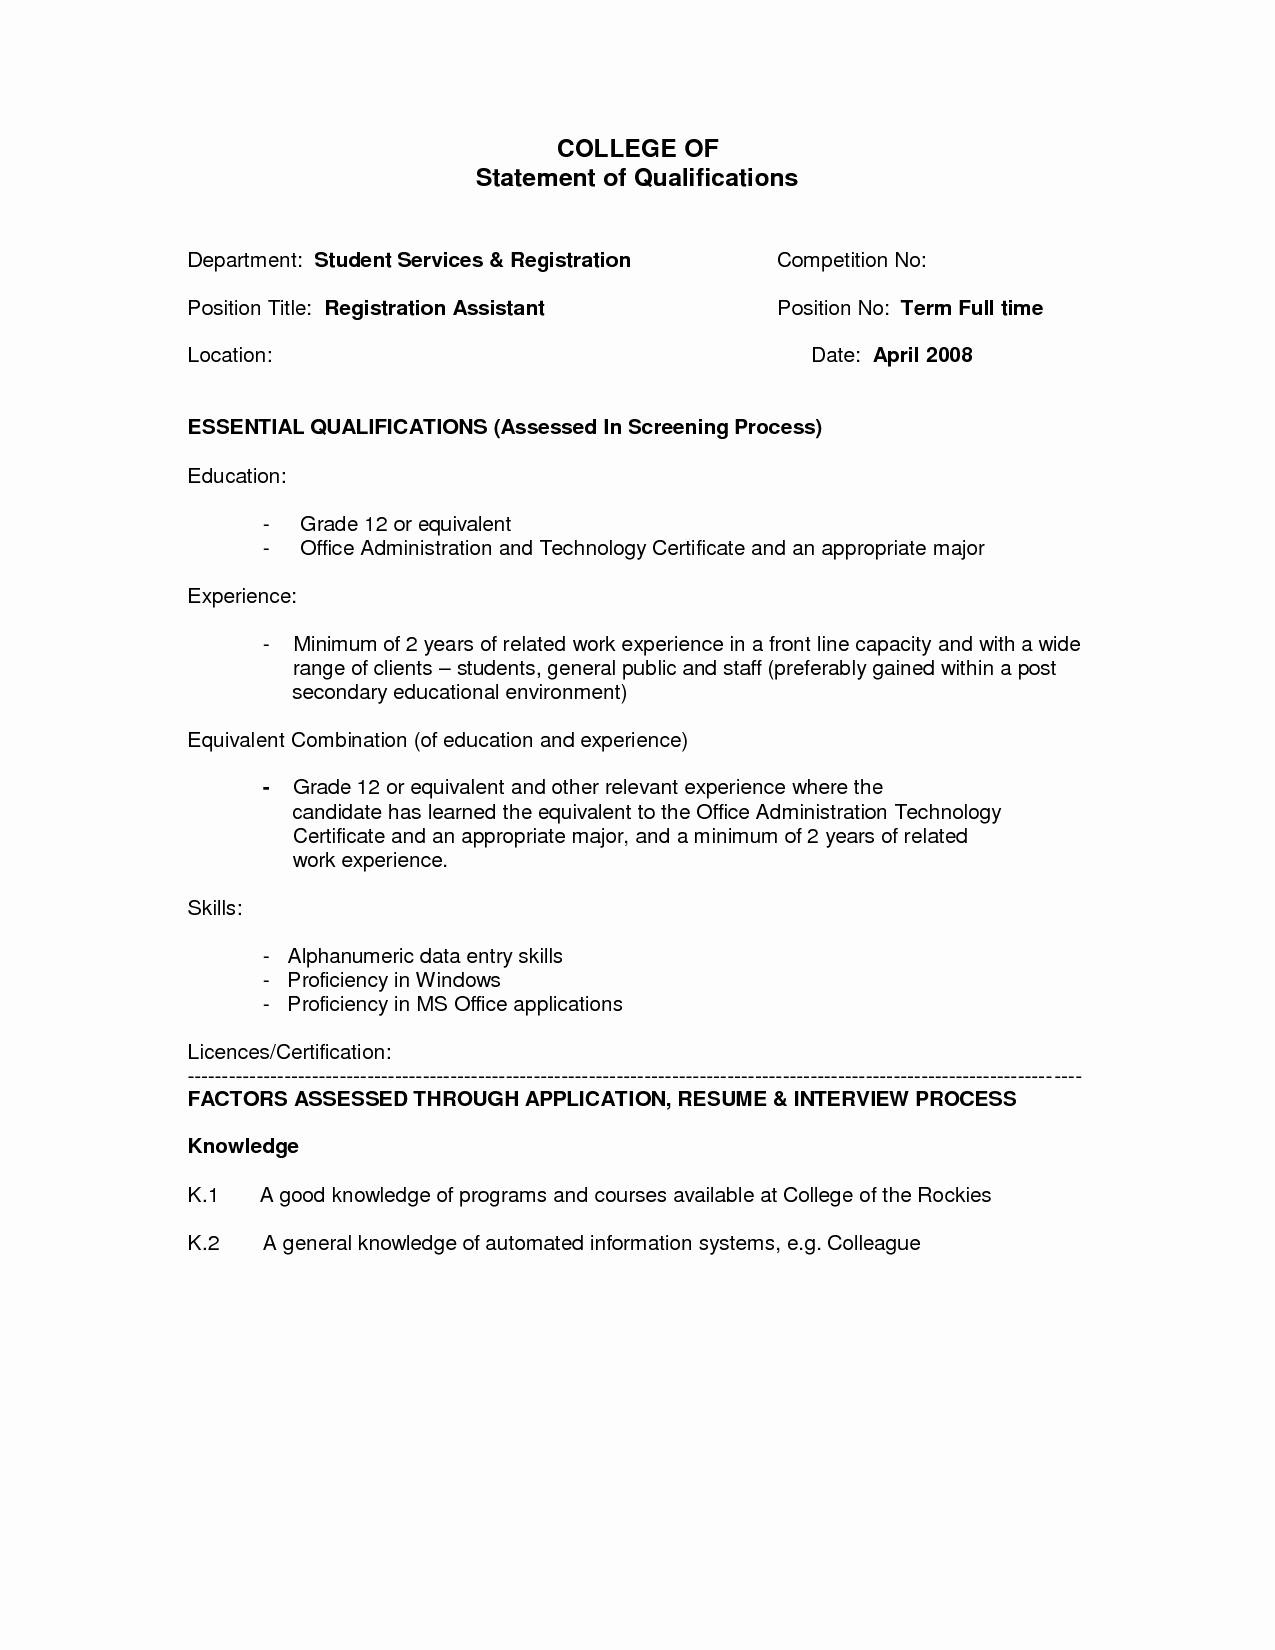 Resume for Internal Promotion Template Lovely Resume for Internal Promotion Resume Ideas